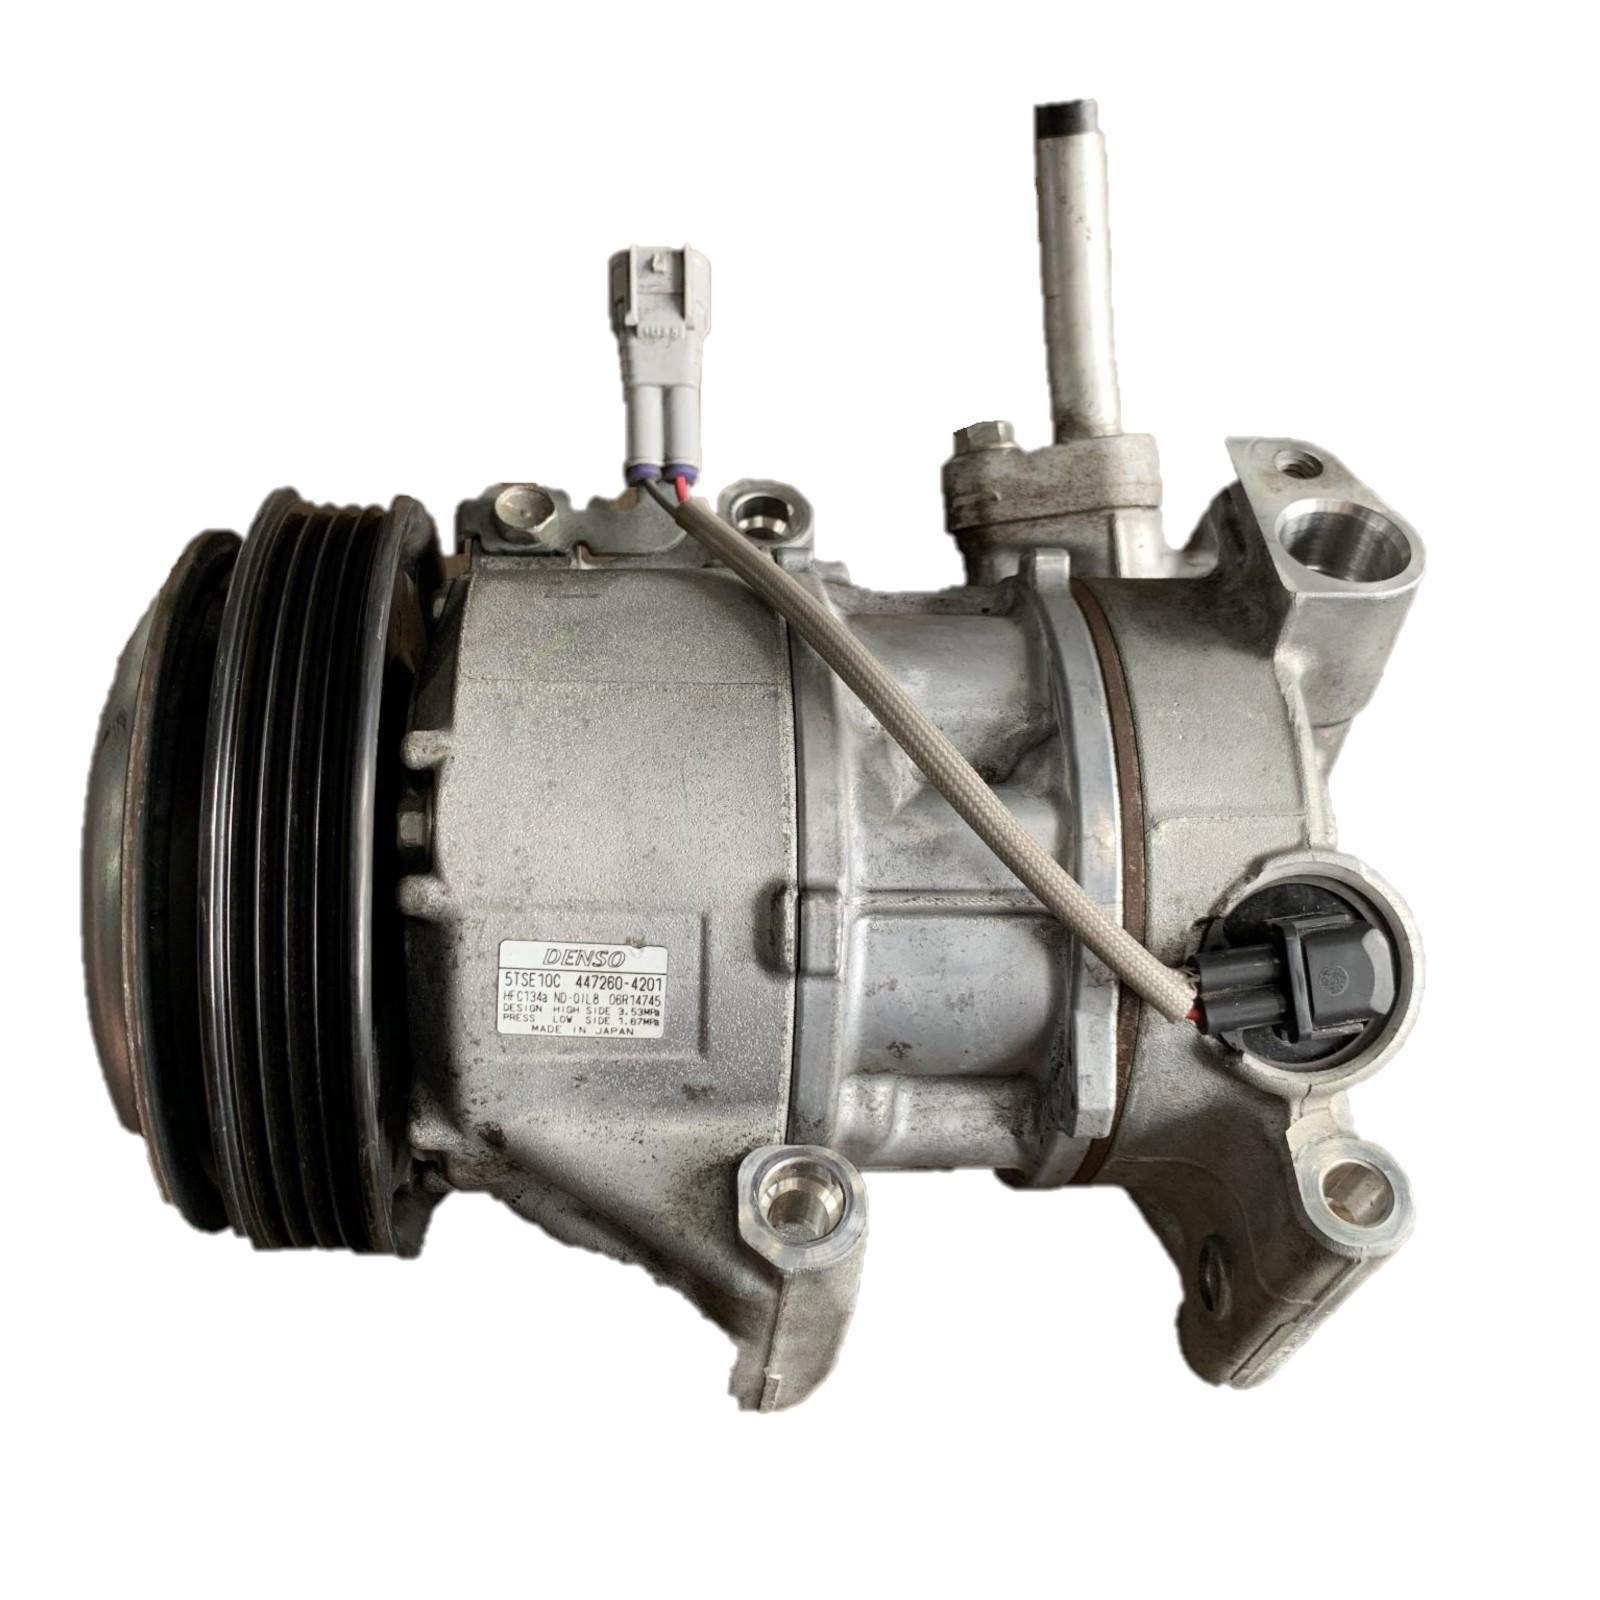 TOYOTA YARIS, A/C Compressor, NCP13#, 1.5, 1NZ, 11/11-